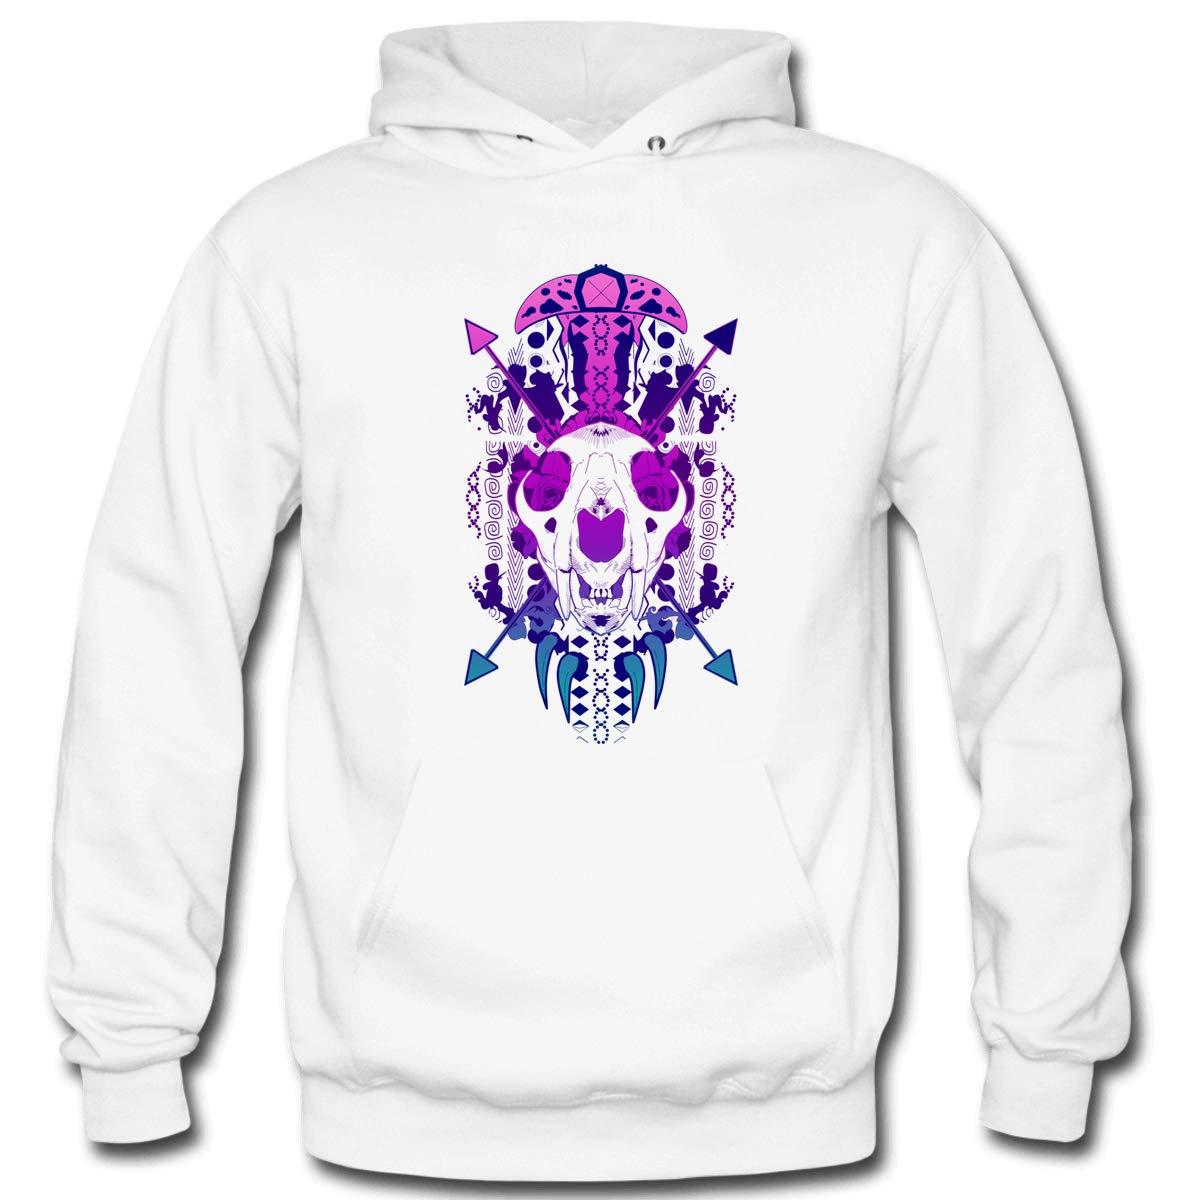 Mens Lion Skull Hooded Sweatshirt Funny Printed Pullover Hoodies Classic Long Sleeve T Shirt Tops